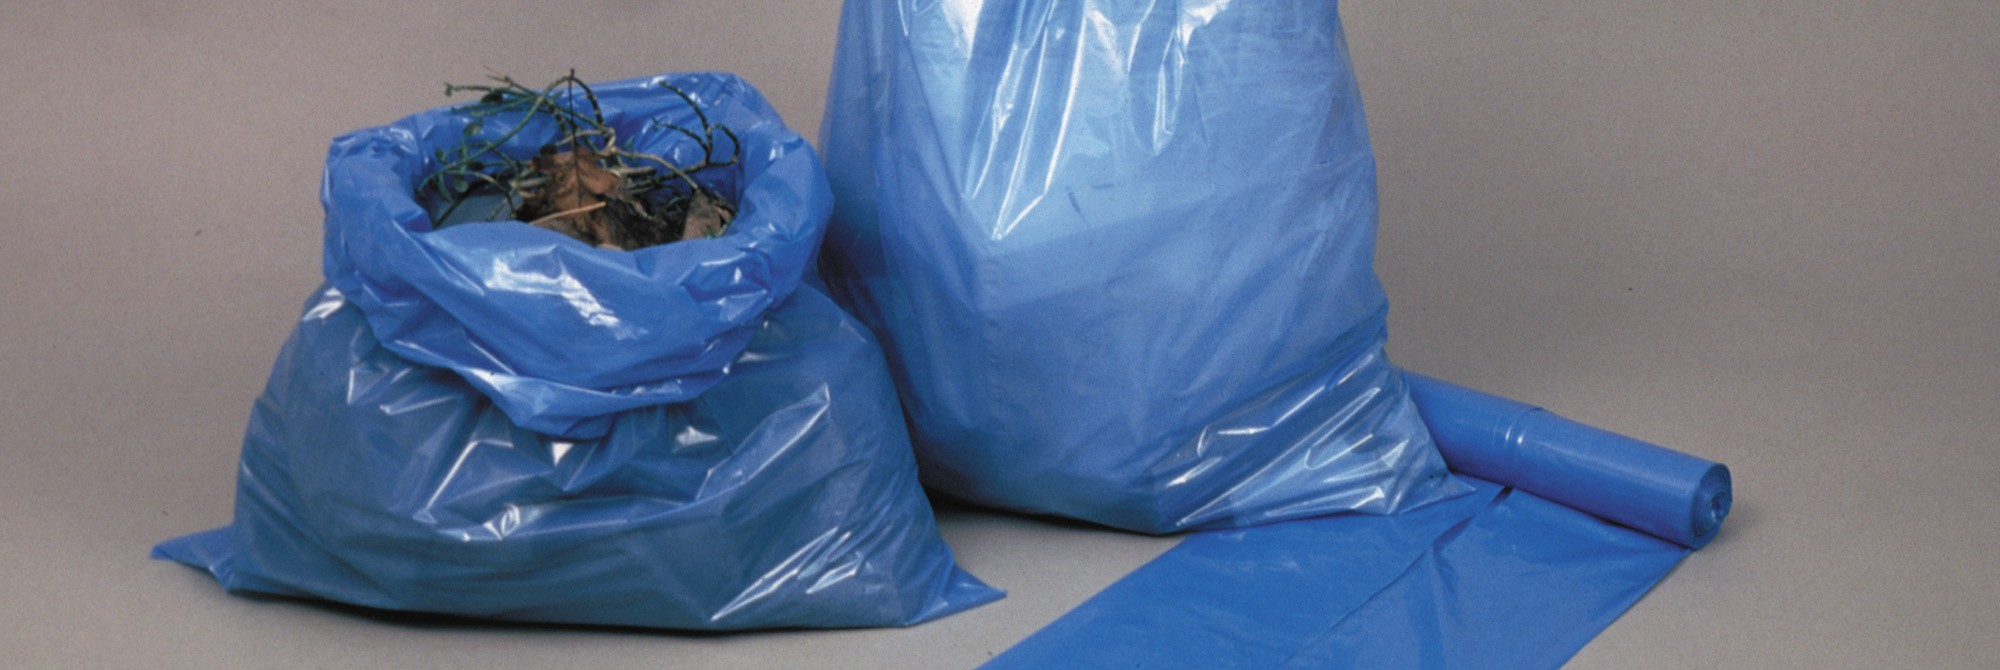 Owolen Müllsäcke